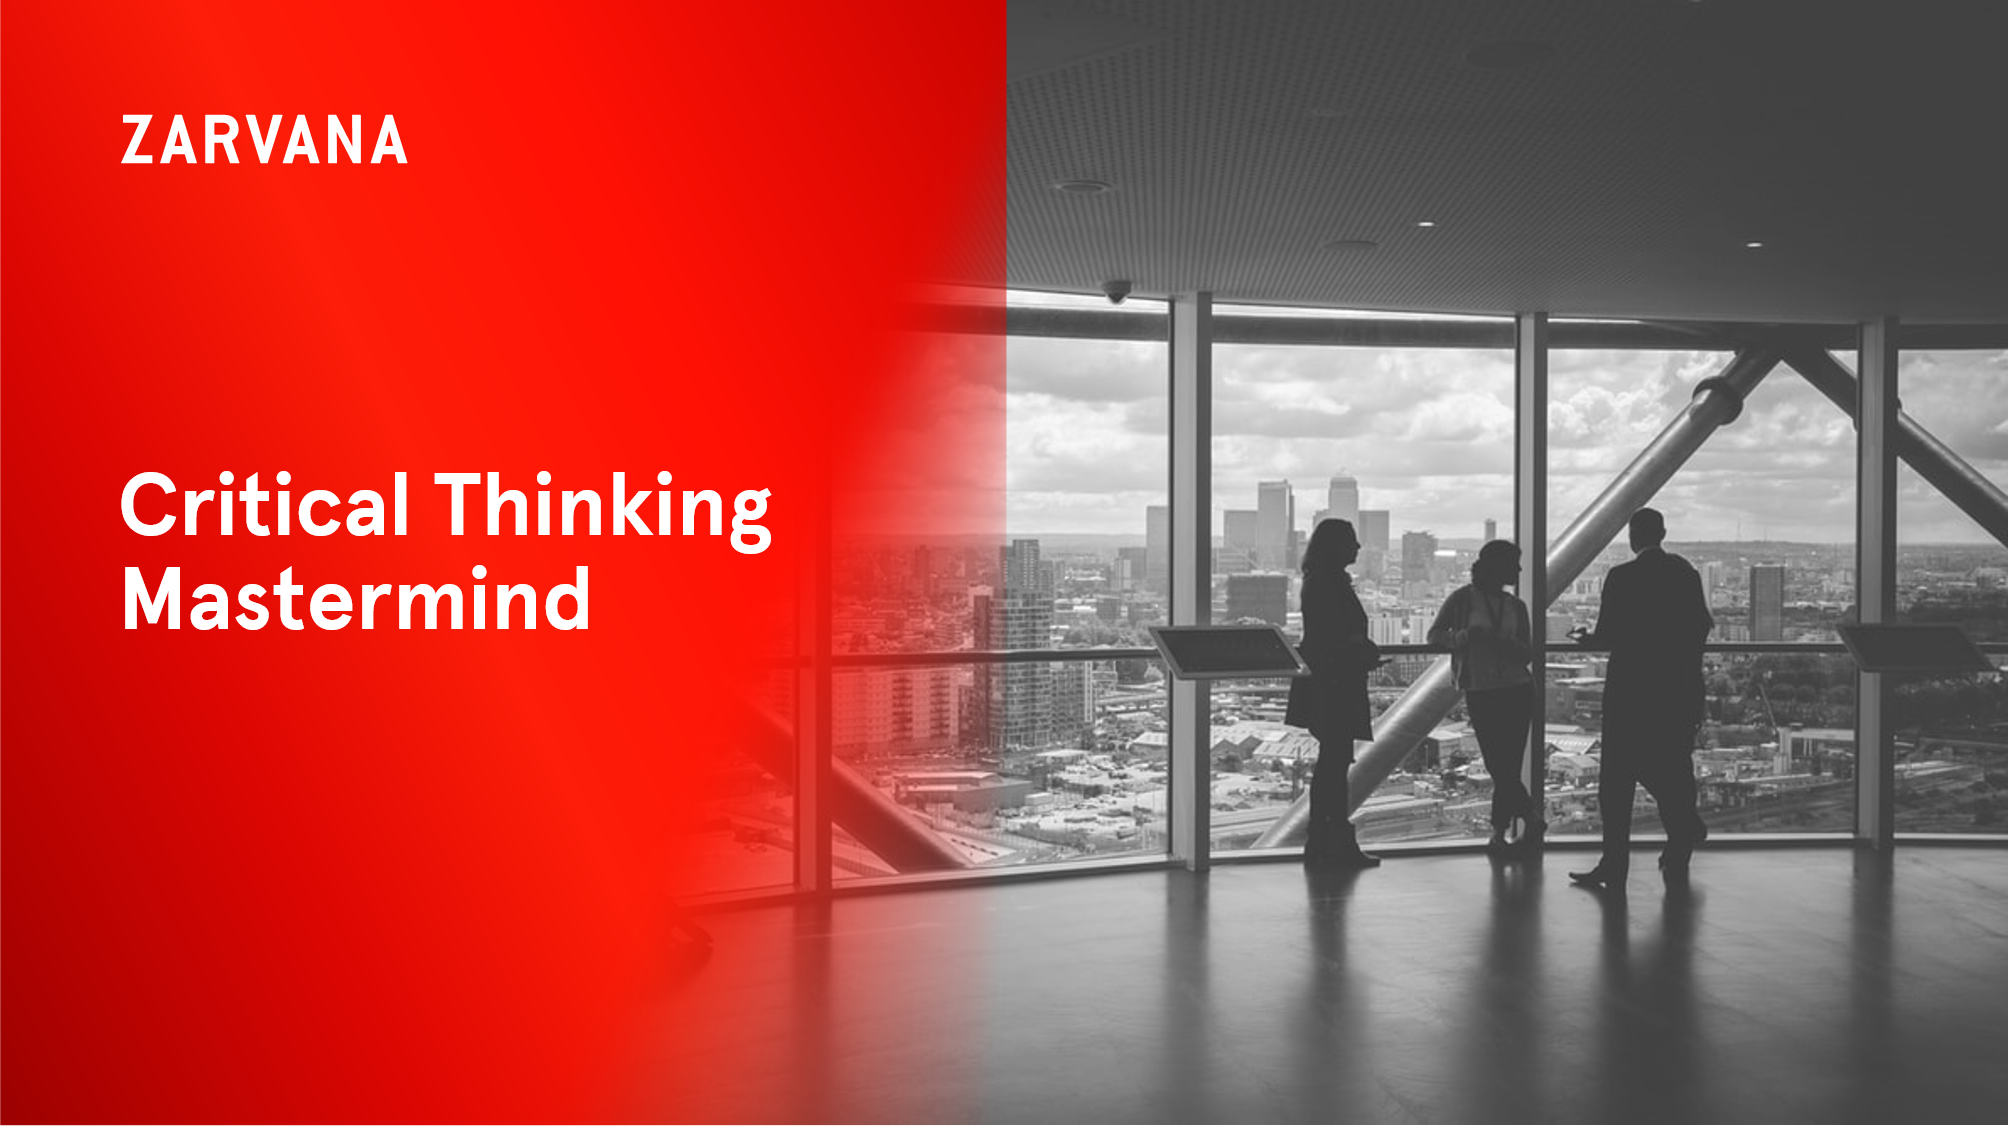 Critical thinking mastermind